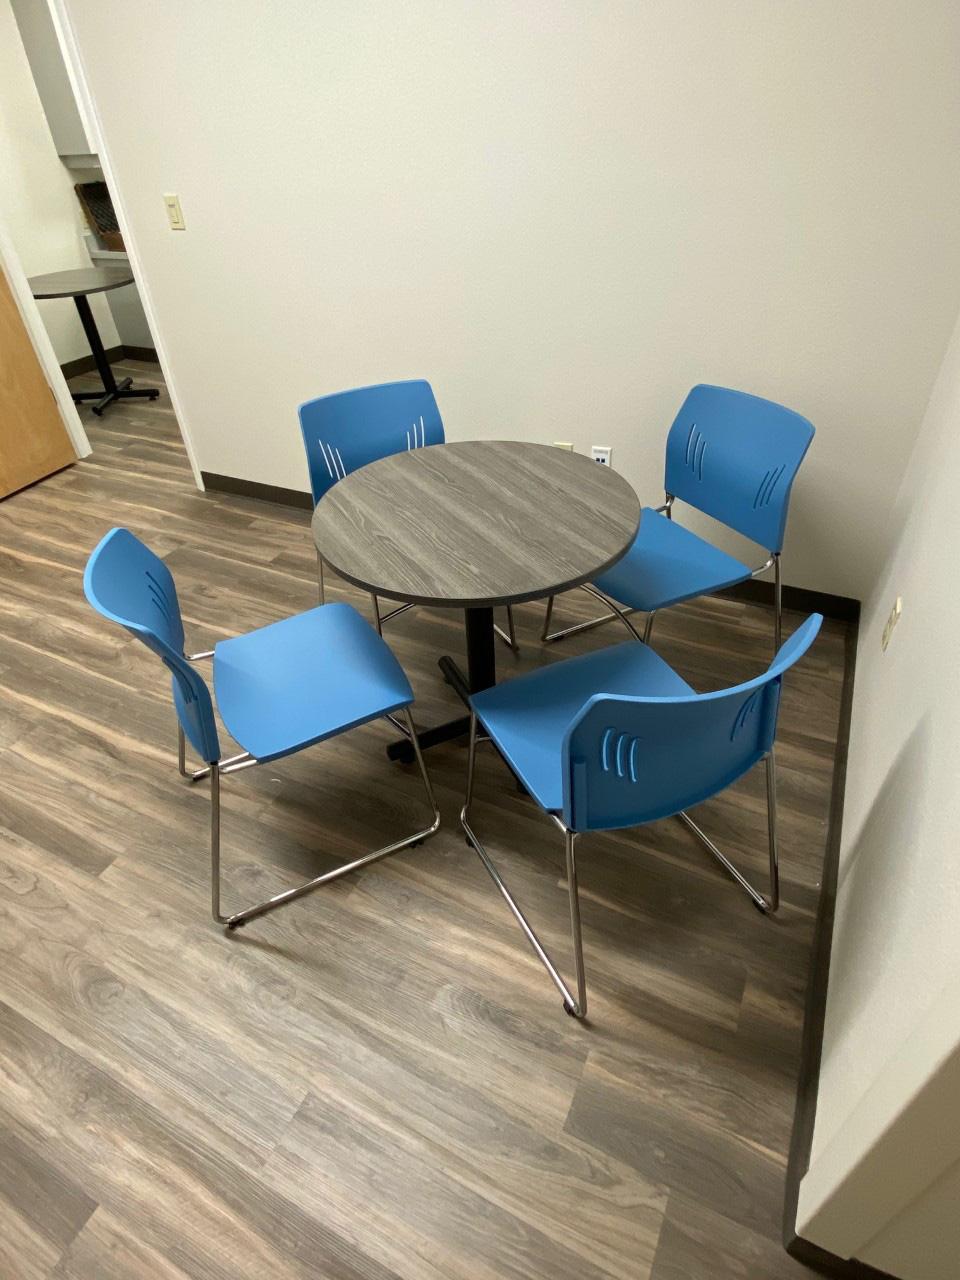 furniture-office-supplies-in-bradenton-florida-3-.jpg